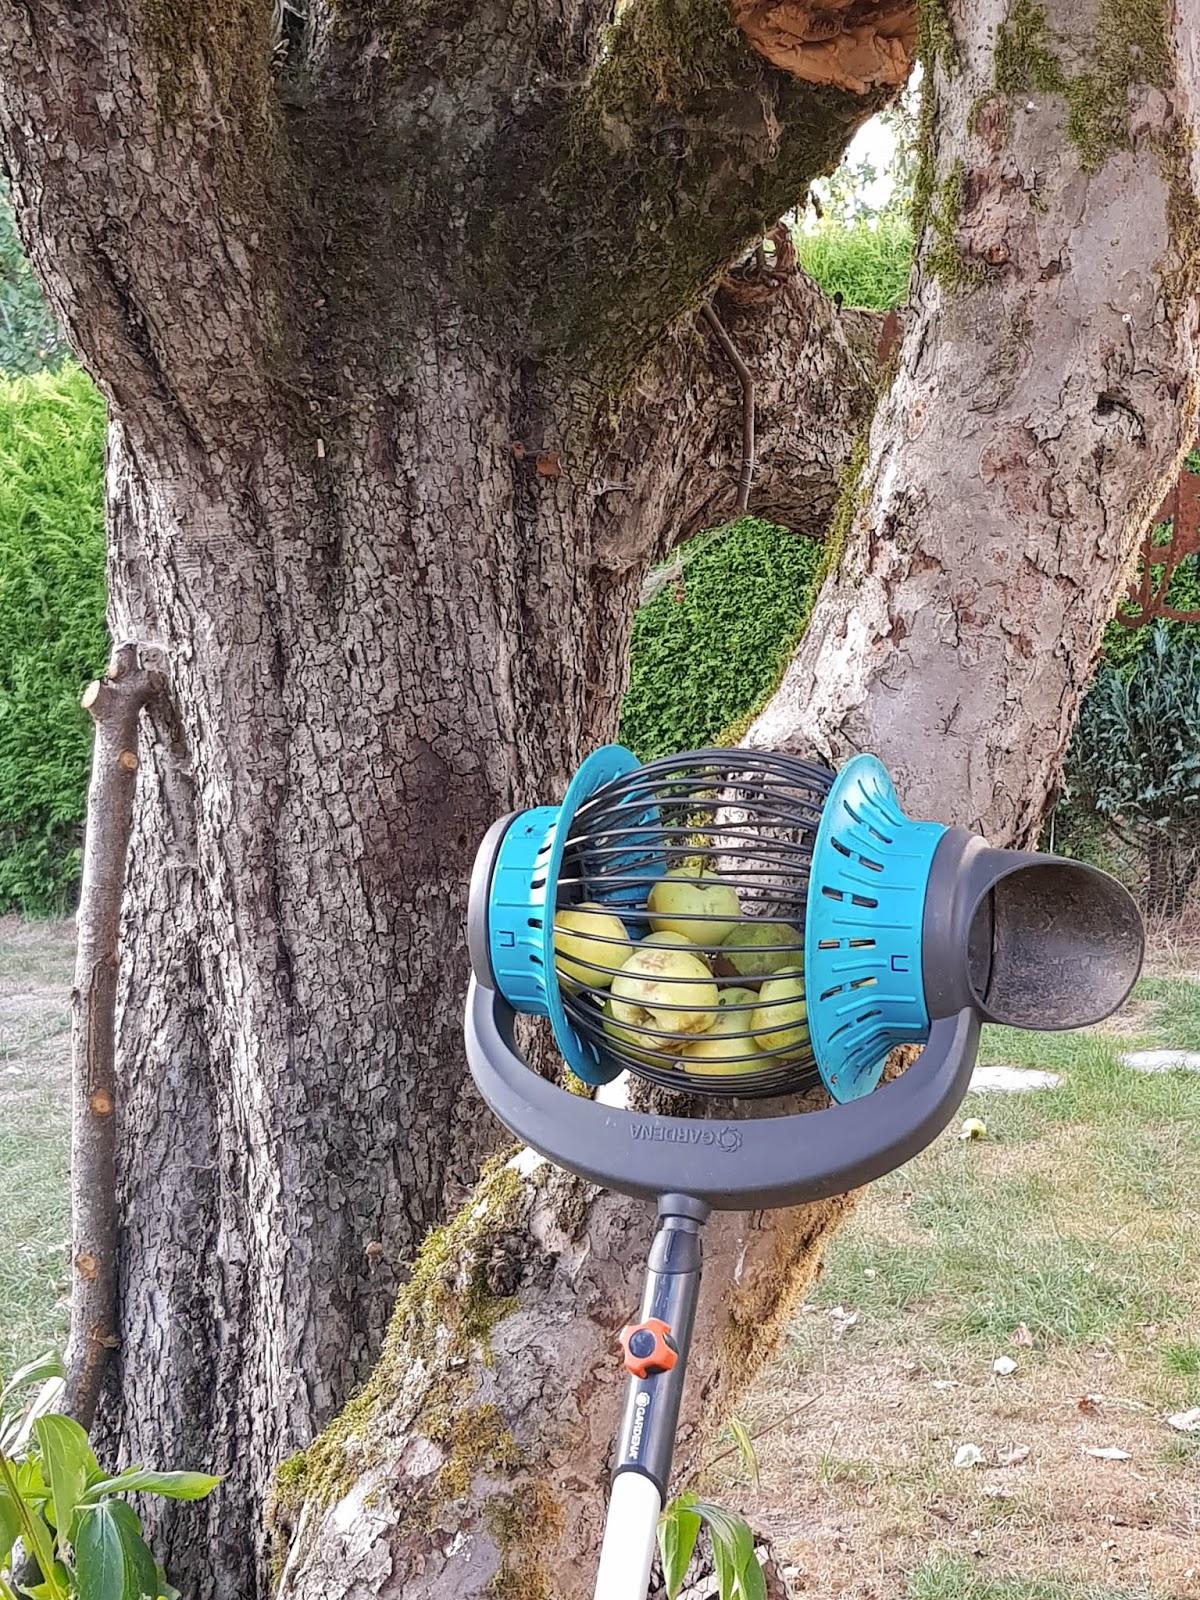 Tipp zum Äpfel sammeln. leicht gemacht mit dem Rollsammler Herbst, Rücken, Apfel ernten Rückenschonend, Tipps, Ratgeber, pflücken 4